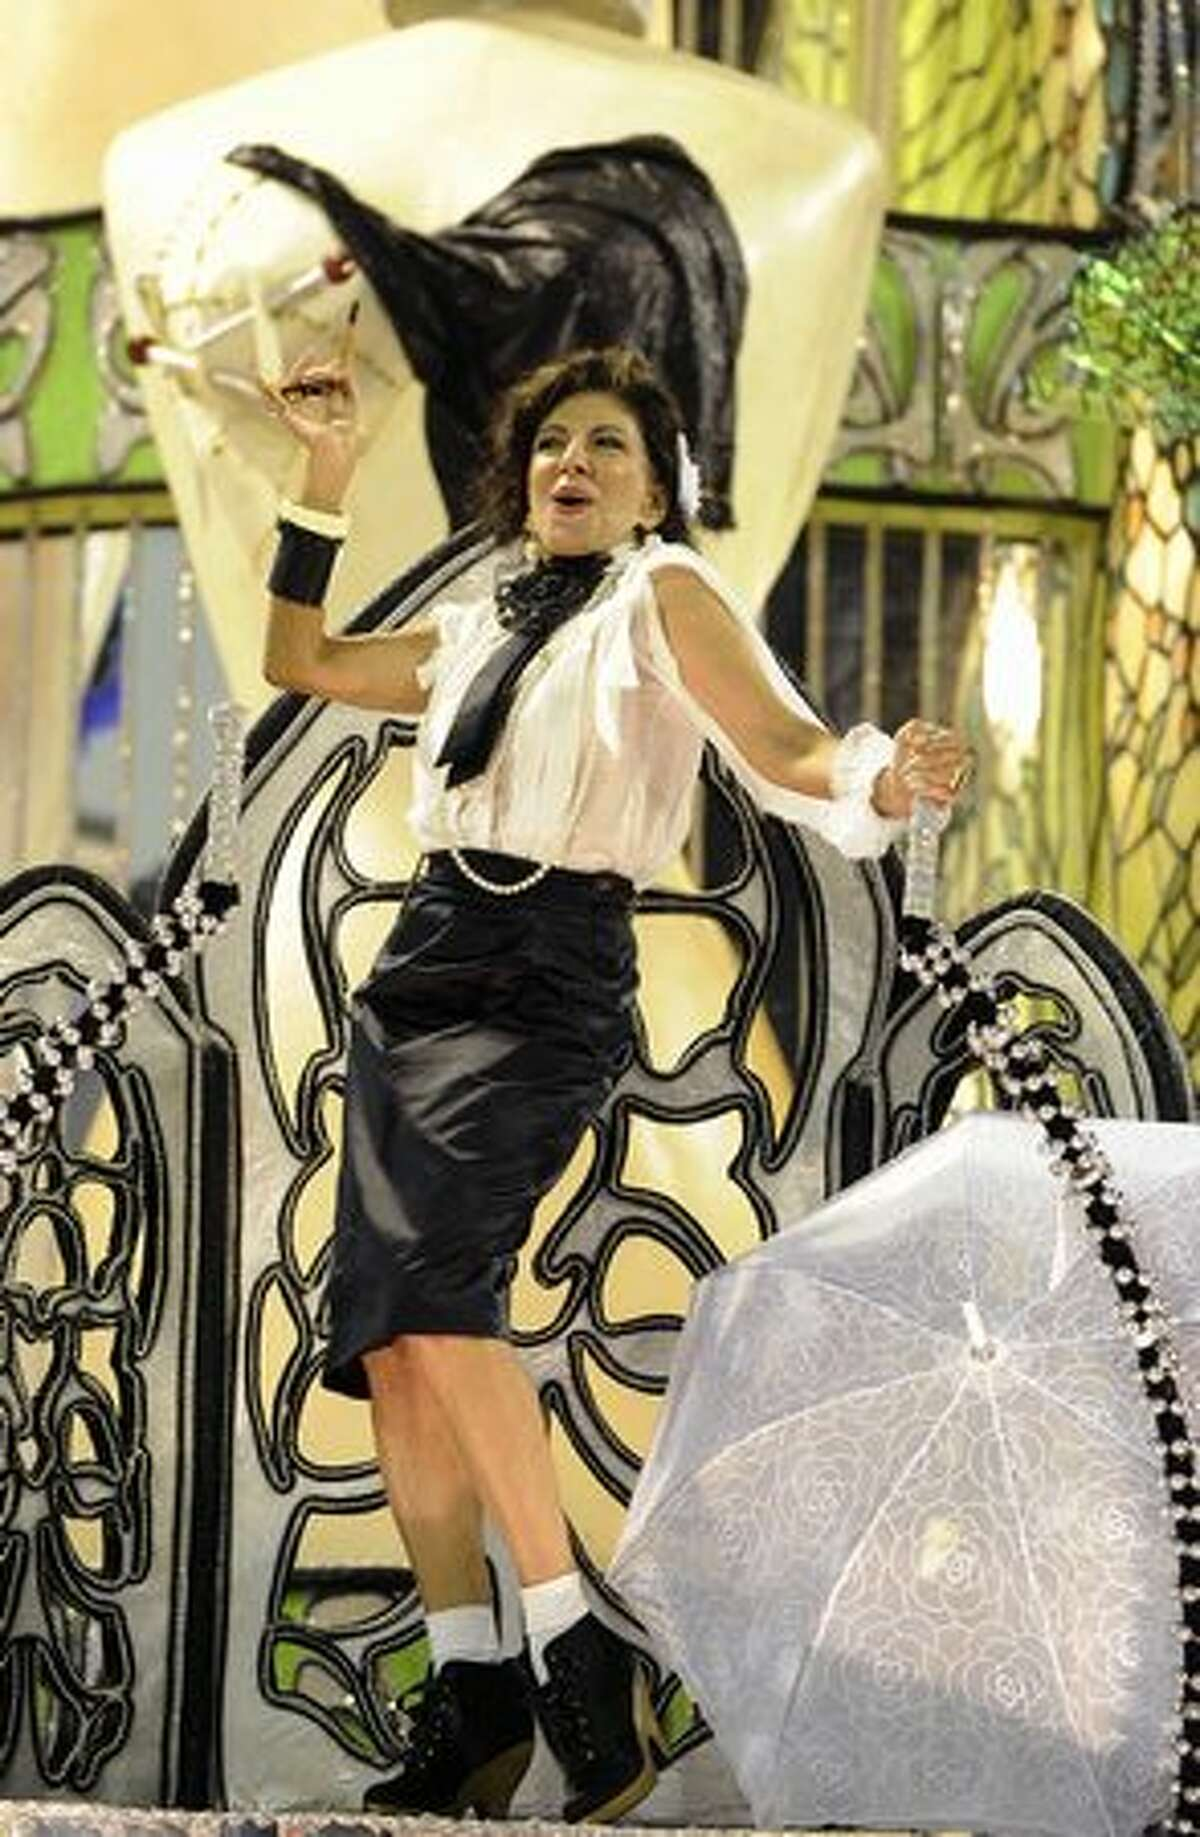 Brazilian actress Marilia Pera represents French stylist Coco Chanel over a float of the samba school Porto da Pedra as part of their theme